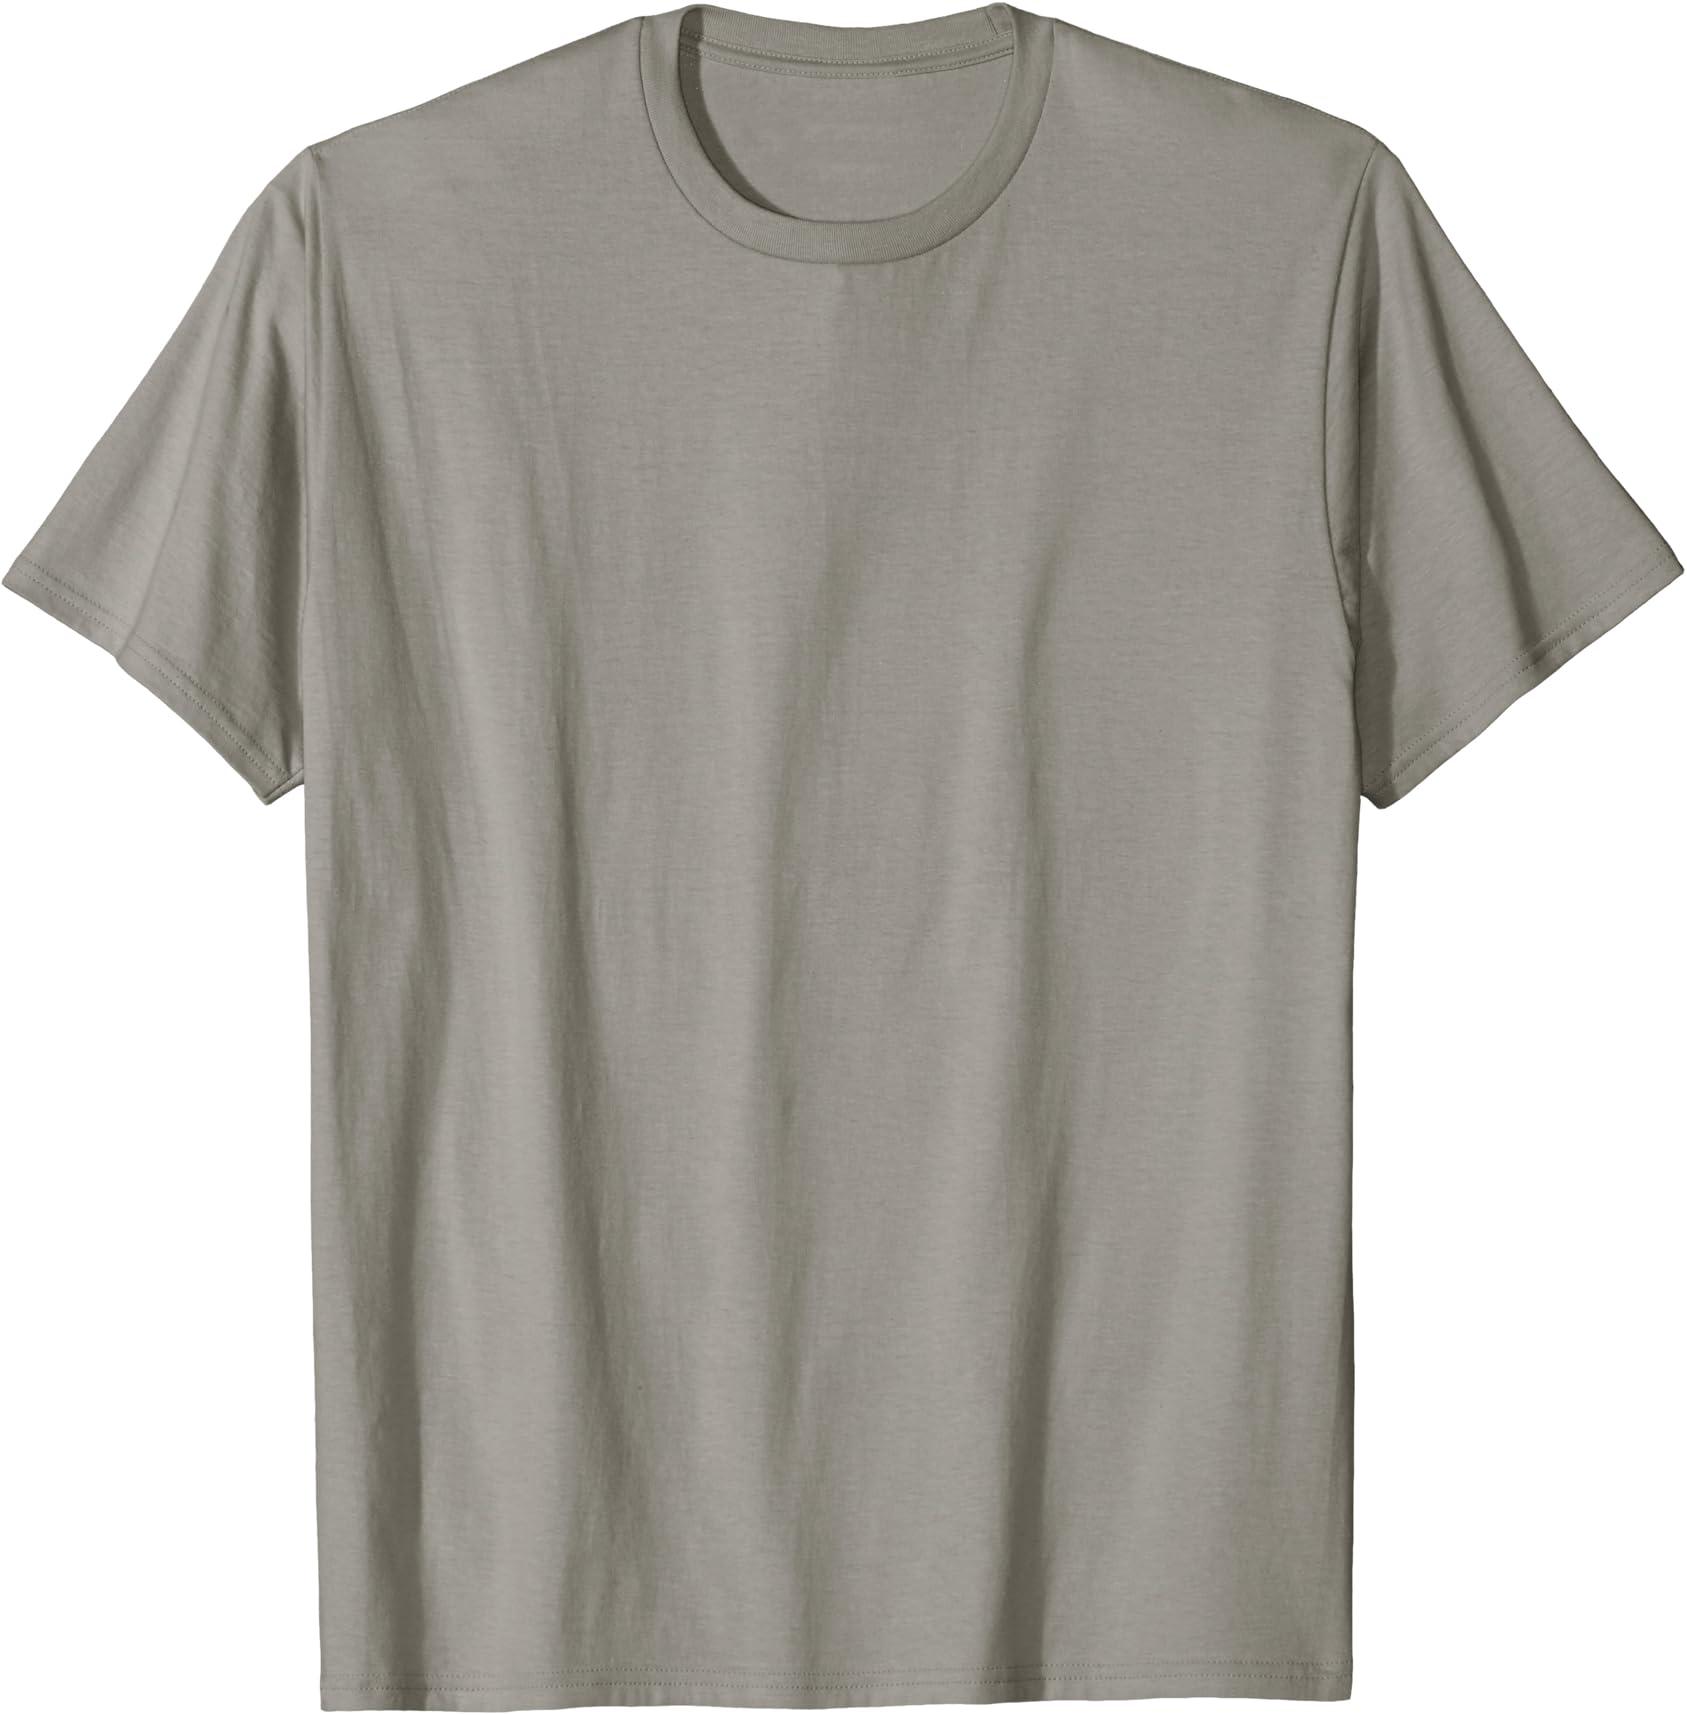 Bash Fork Bomb For Unix Linux Hackers t-shirt